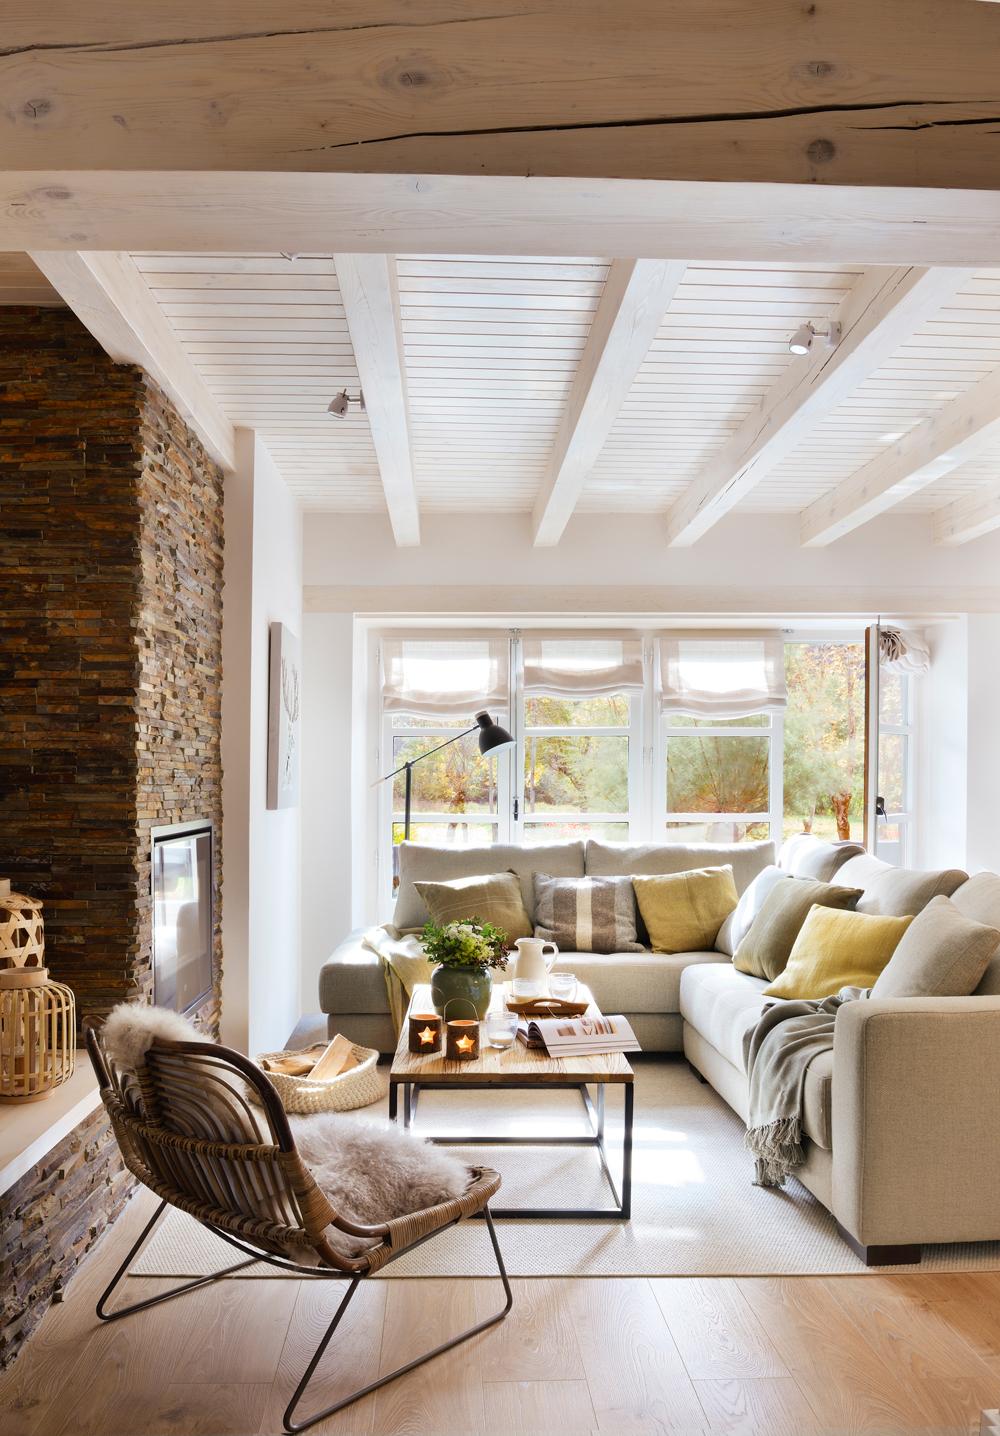 Salones peque os con muebles que aprovechan cada cent metro - Chimeneas para pisos ...